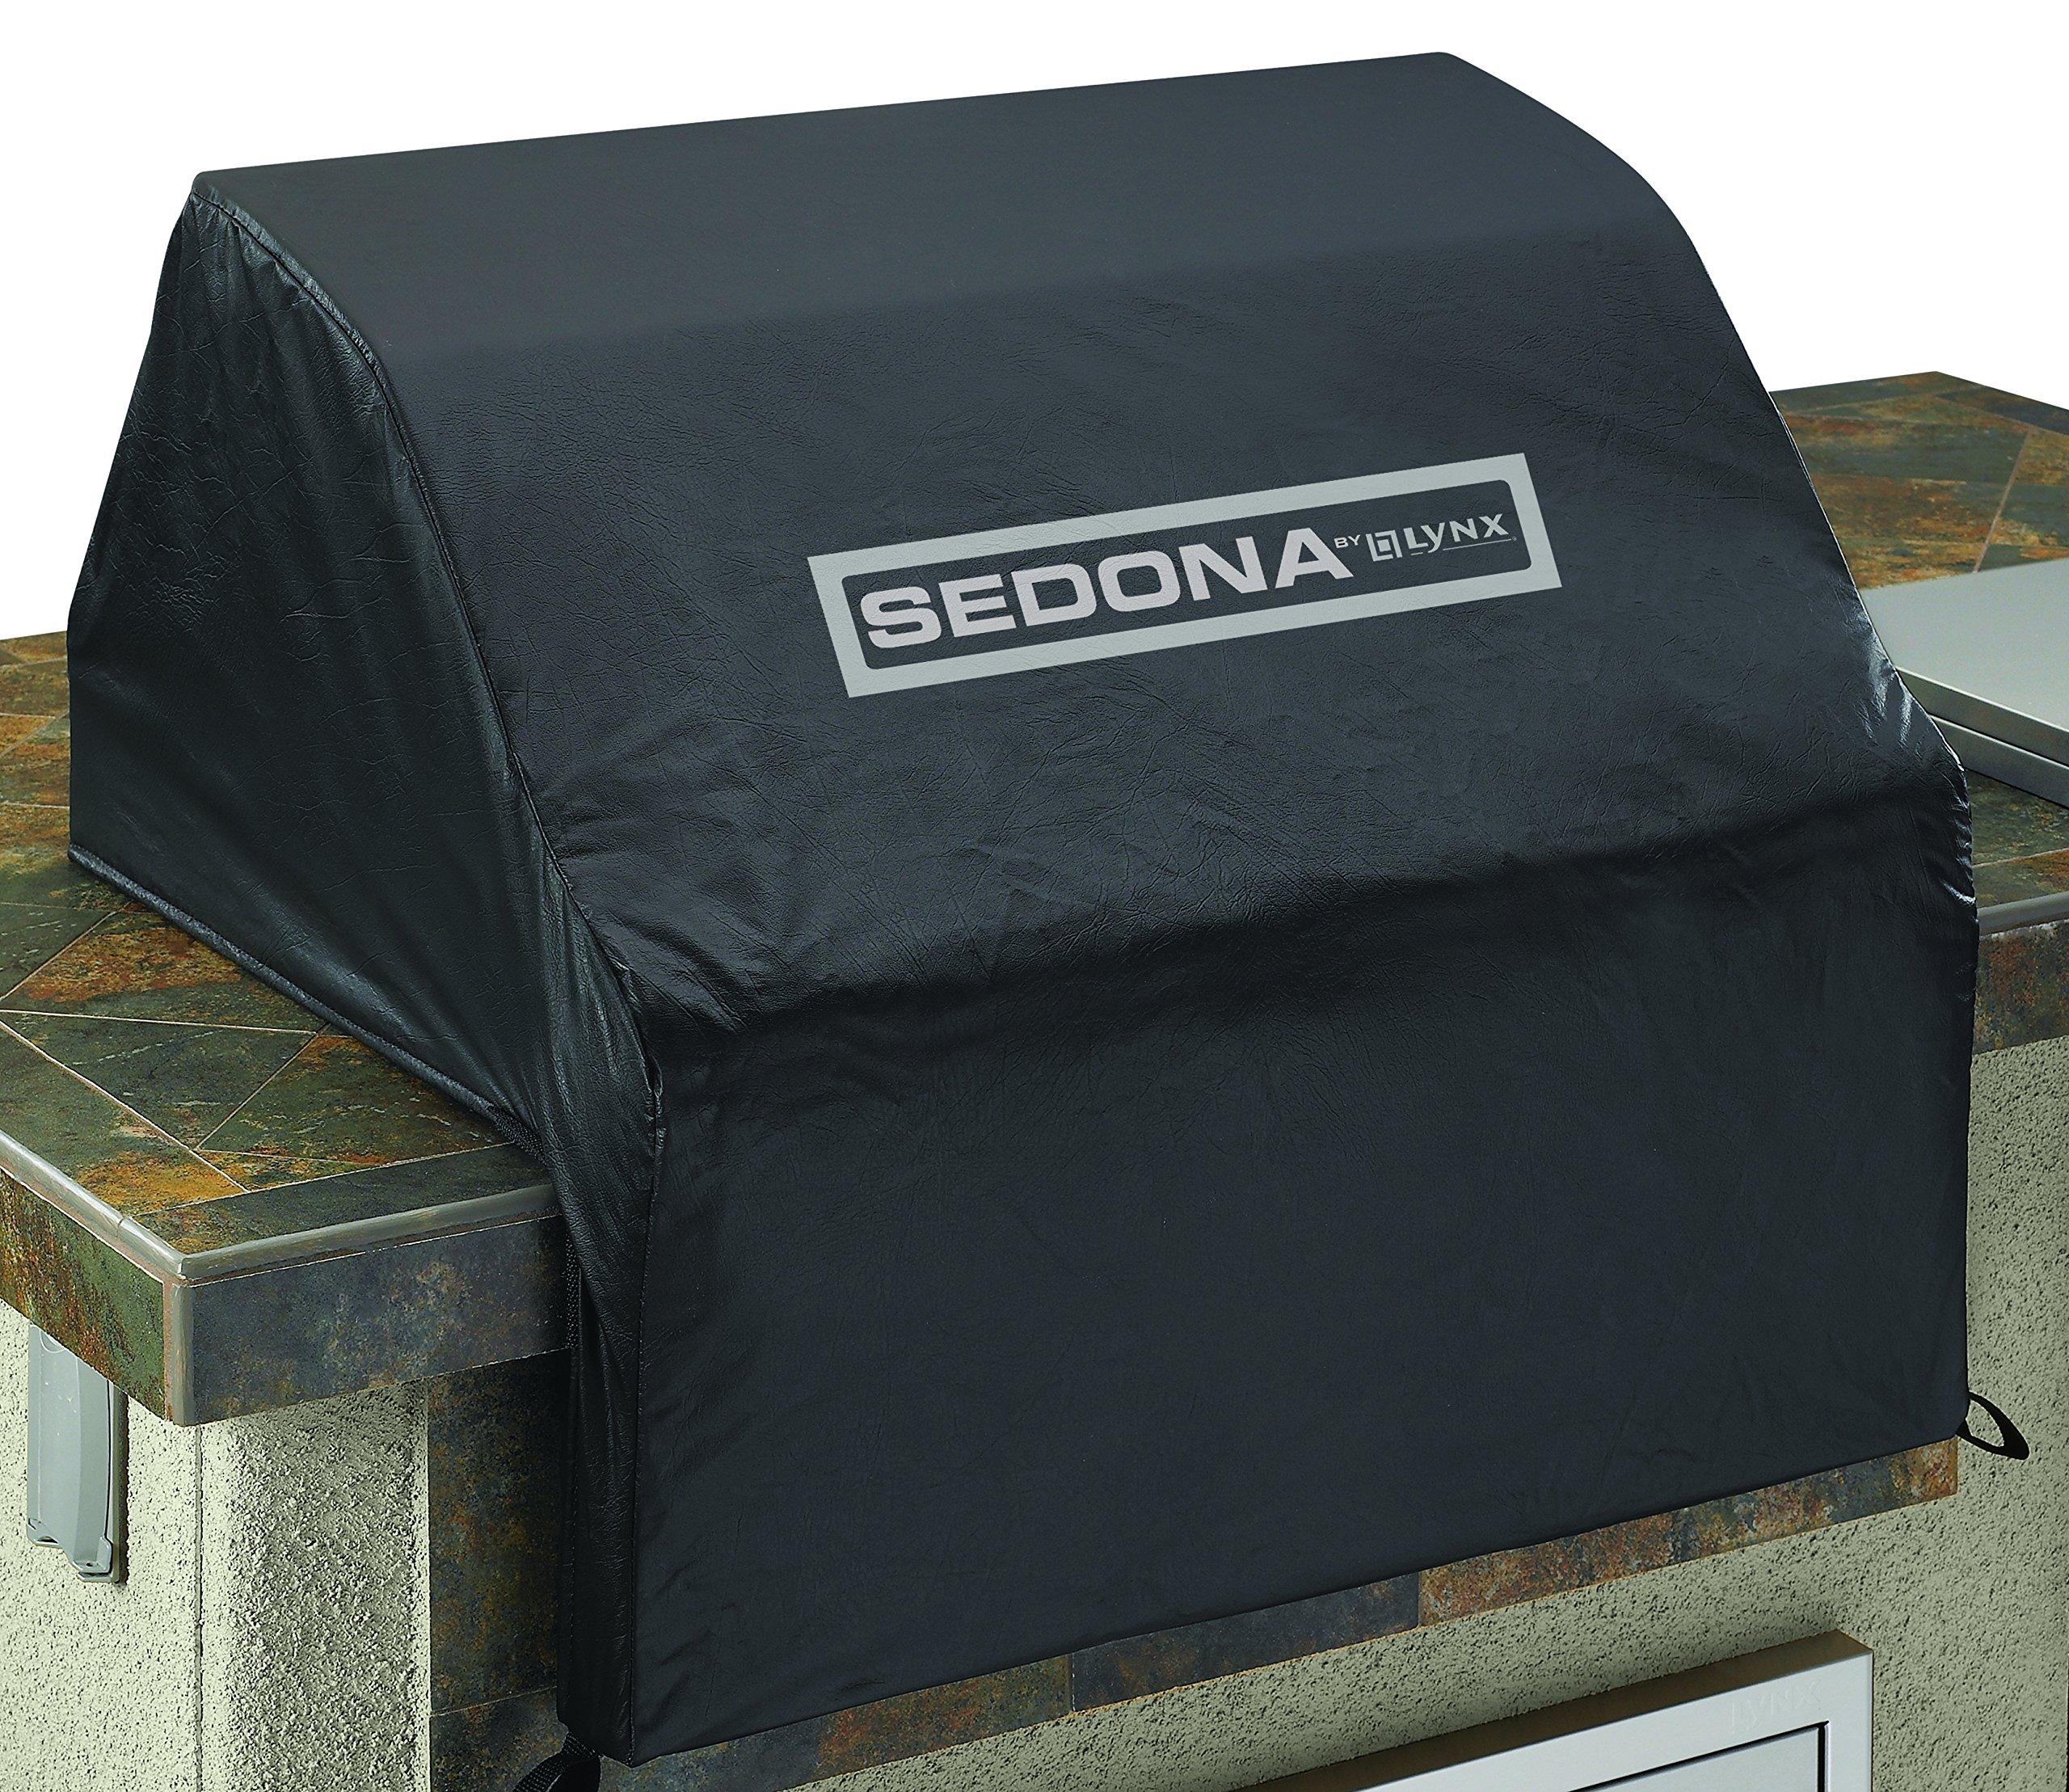 Lynx VC600 Sedona Vinyl Grill Cover for Model L600 Built-In Grill